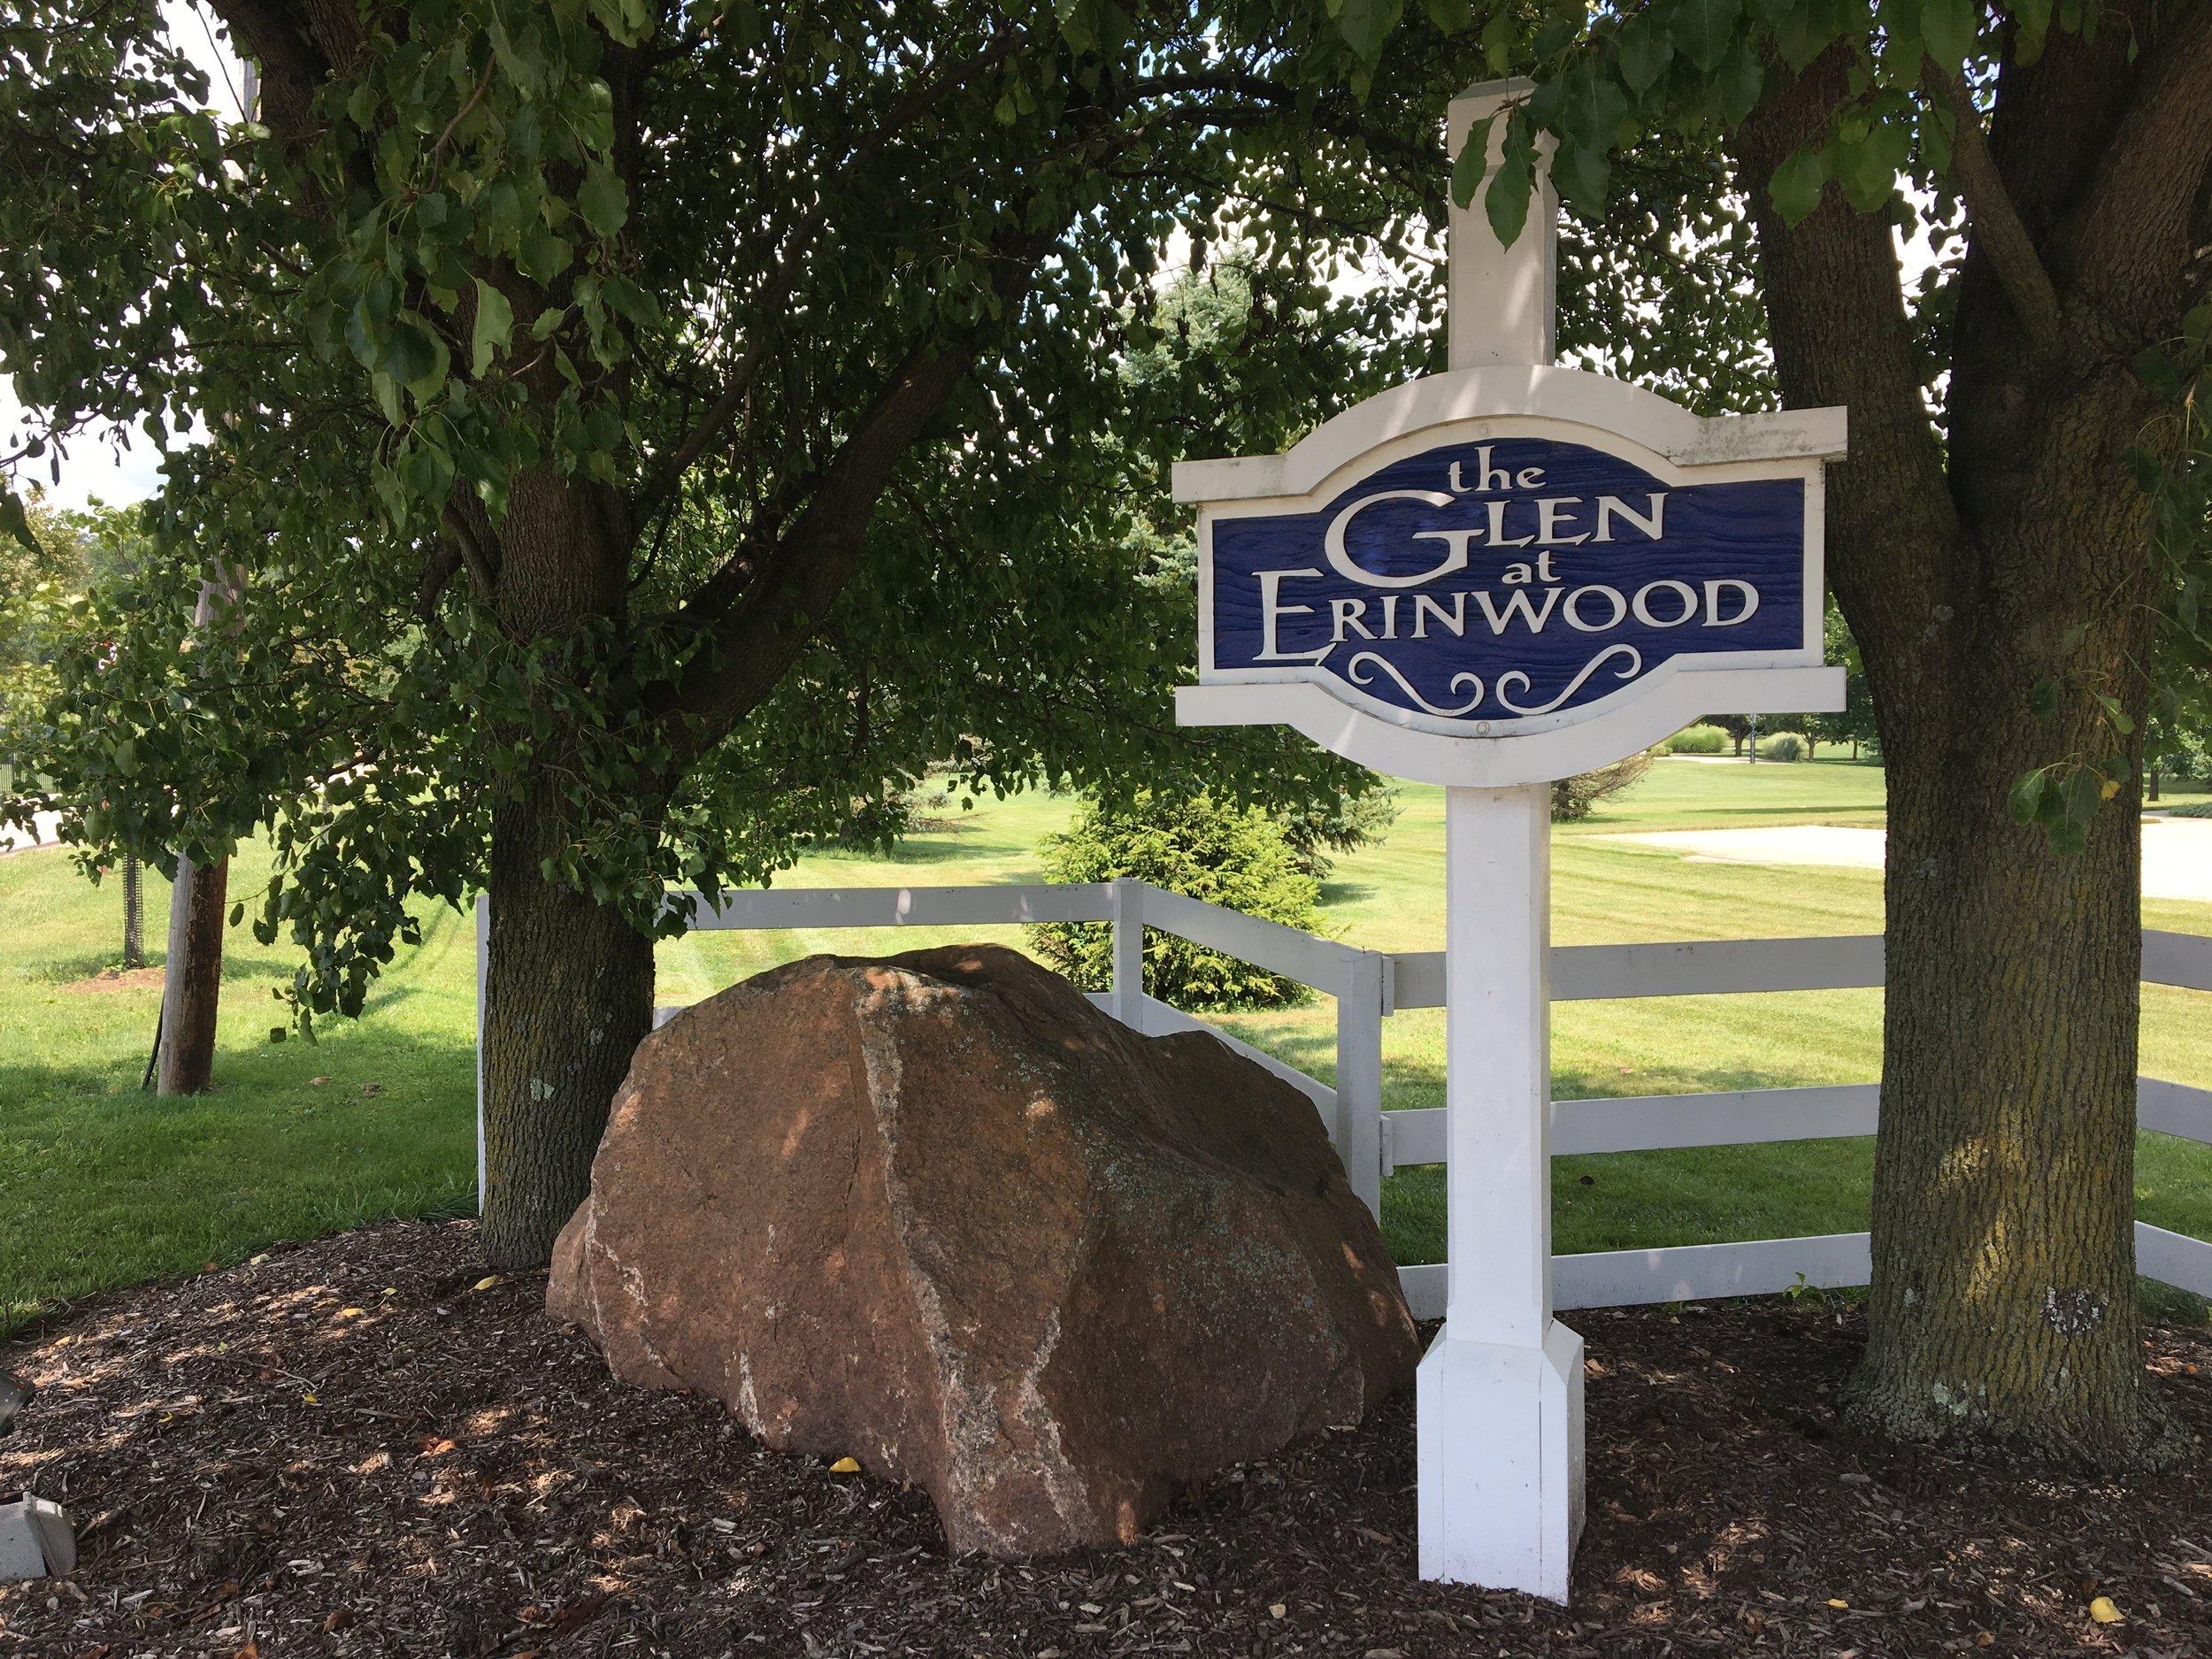 Glen at erinwood -